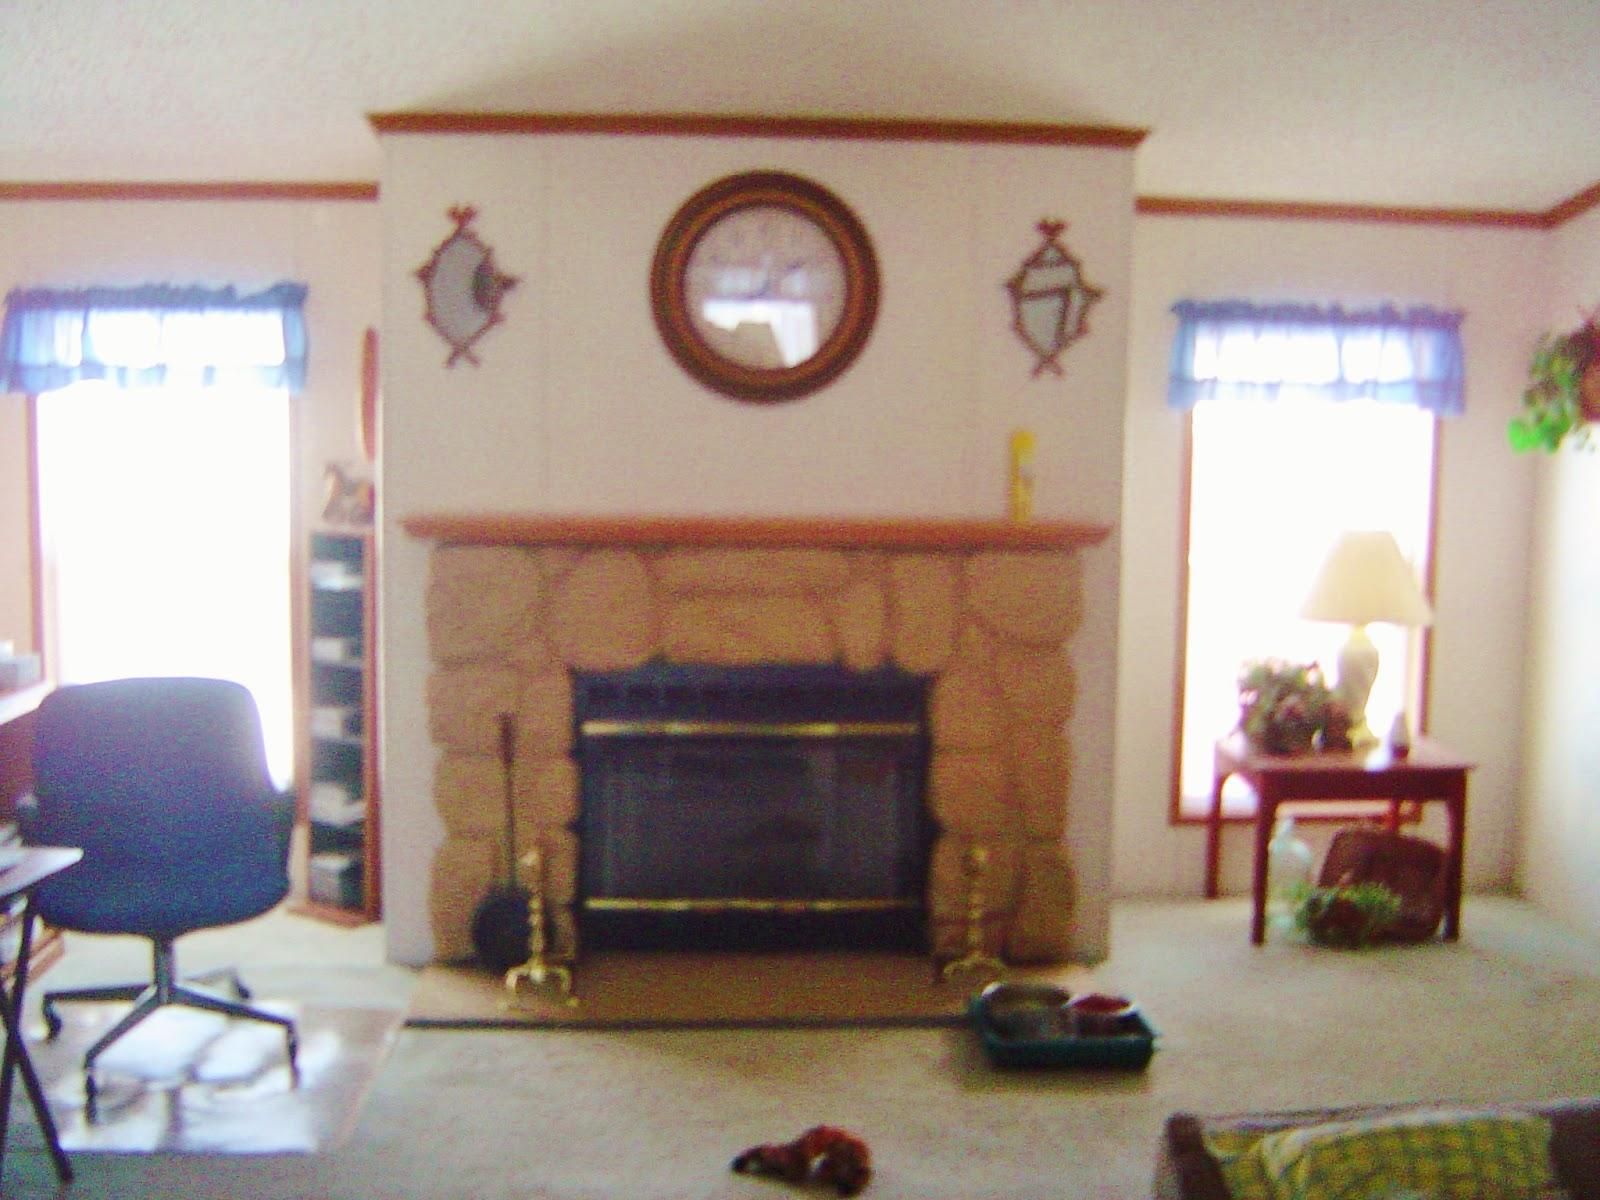 Mobile Home Design Fireplace Mantel Re-Design 2015 | Mobile Home ...